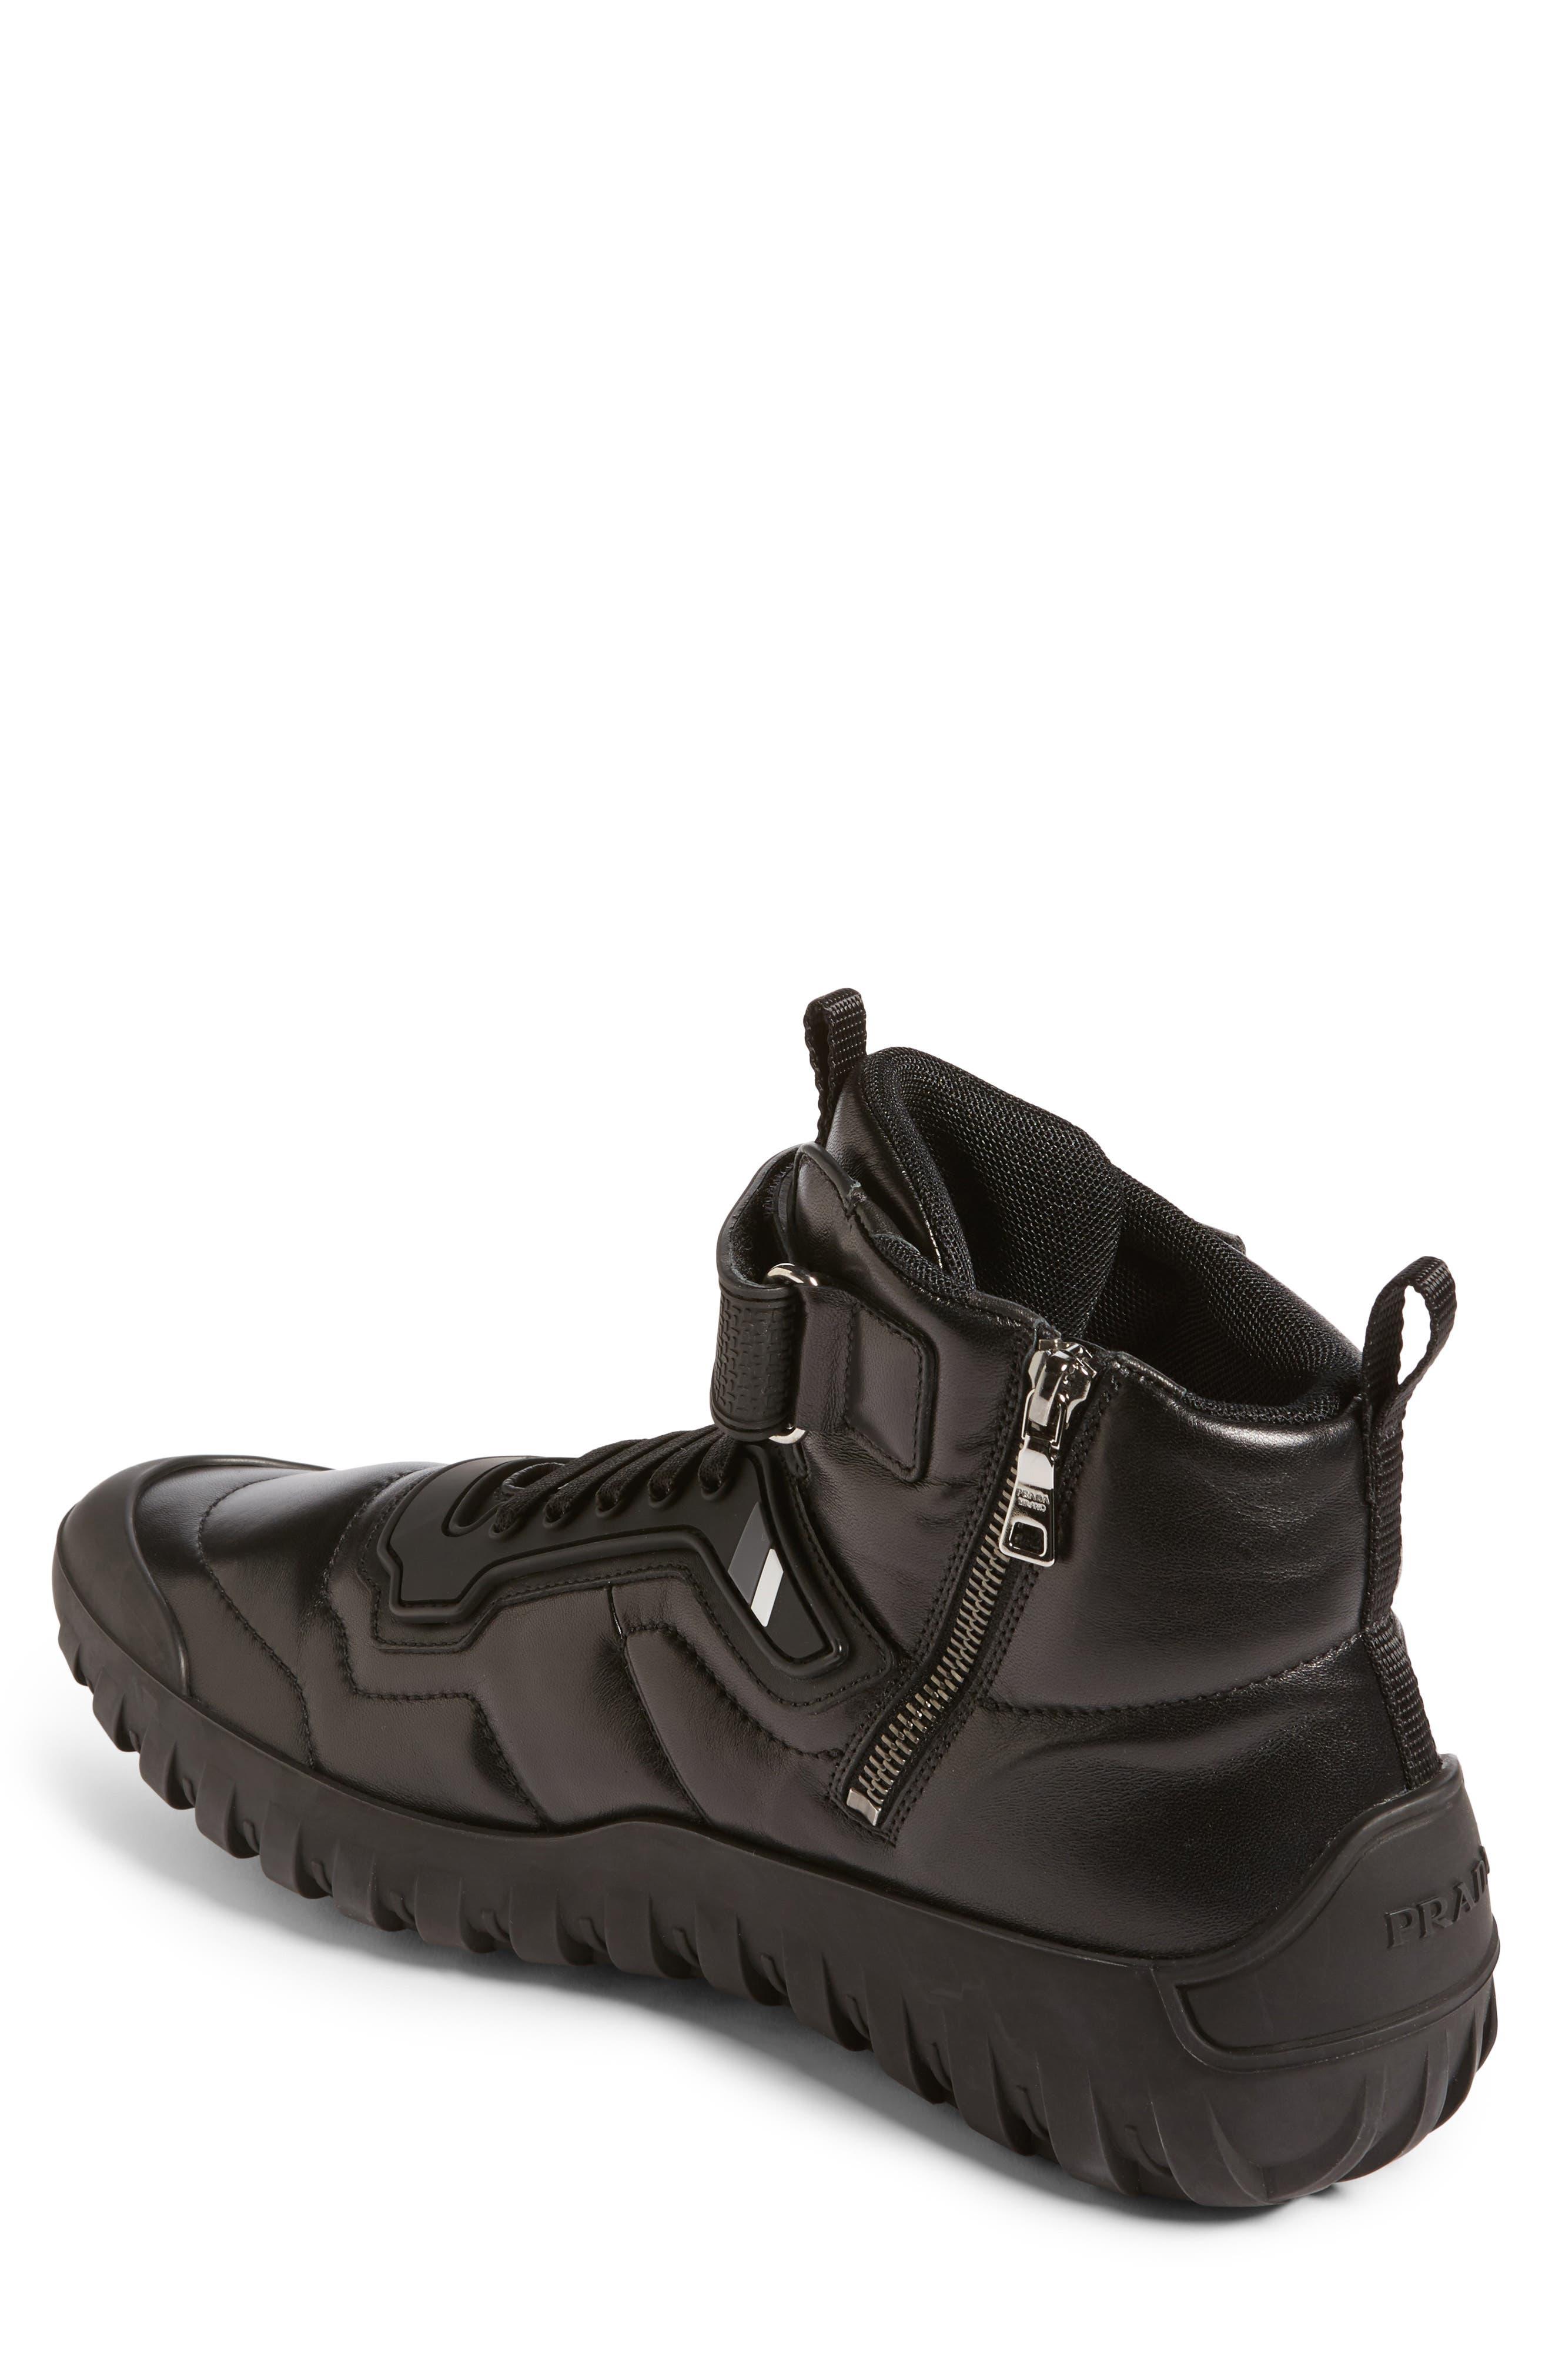 Alternate Image 2  - Prada Linea Rossa Tech Strap Sneaker (Men)